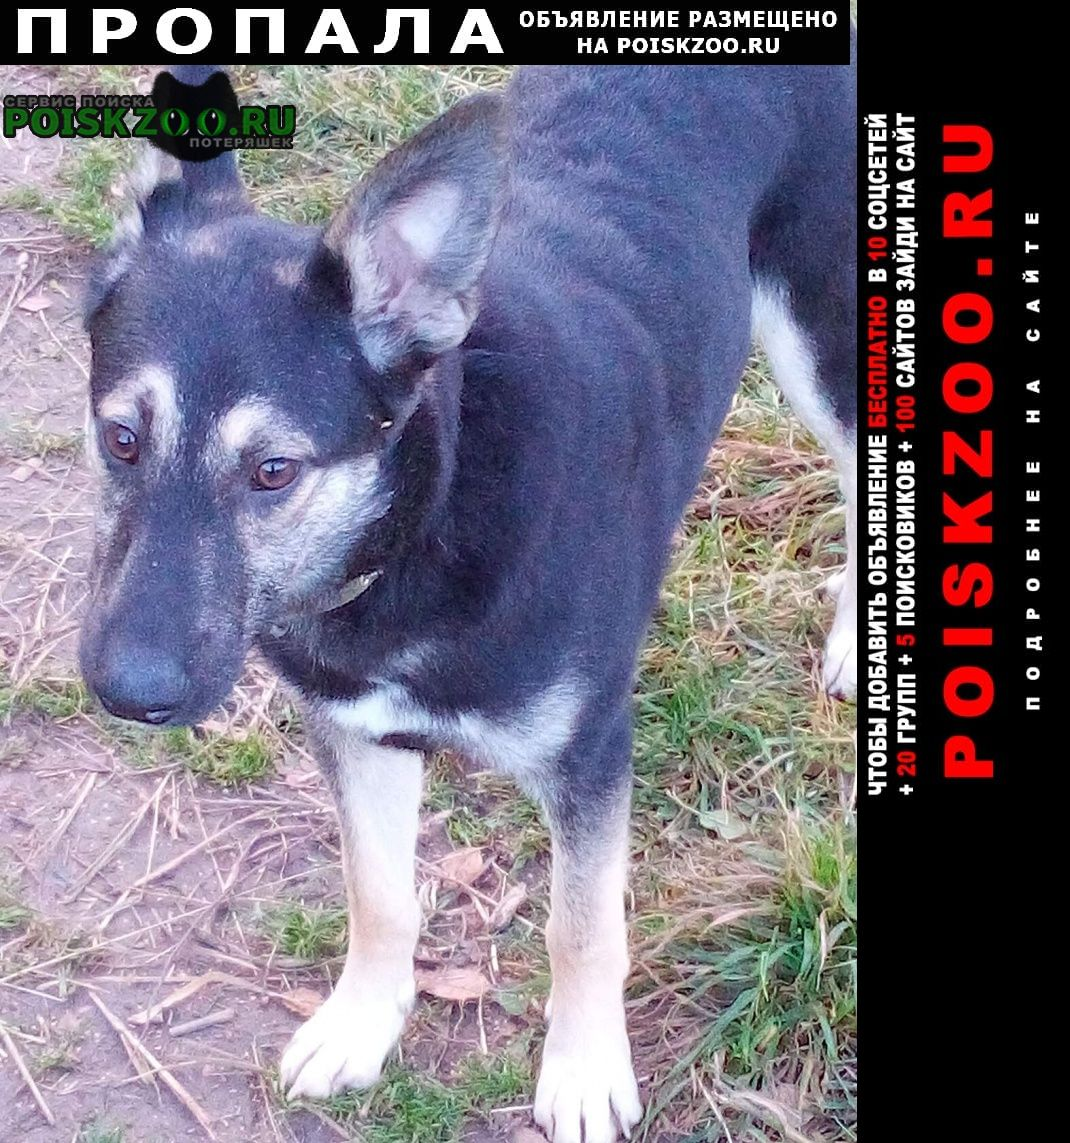 Иваново Пропала собака помогите найти